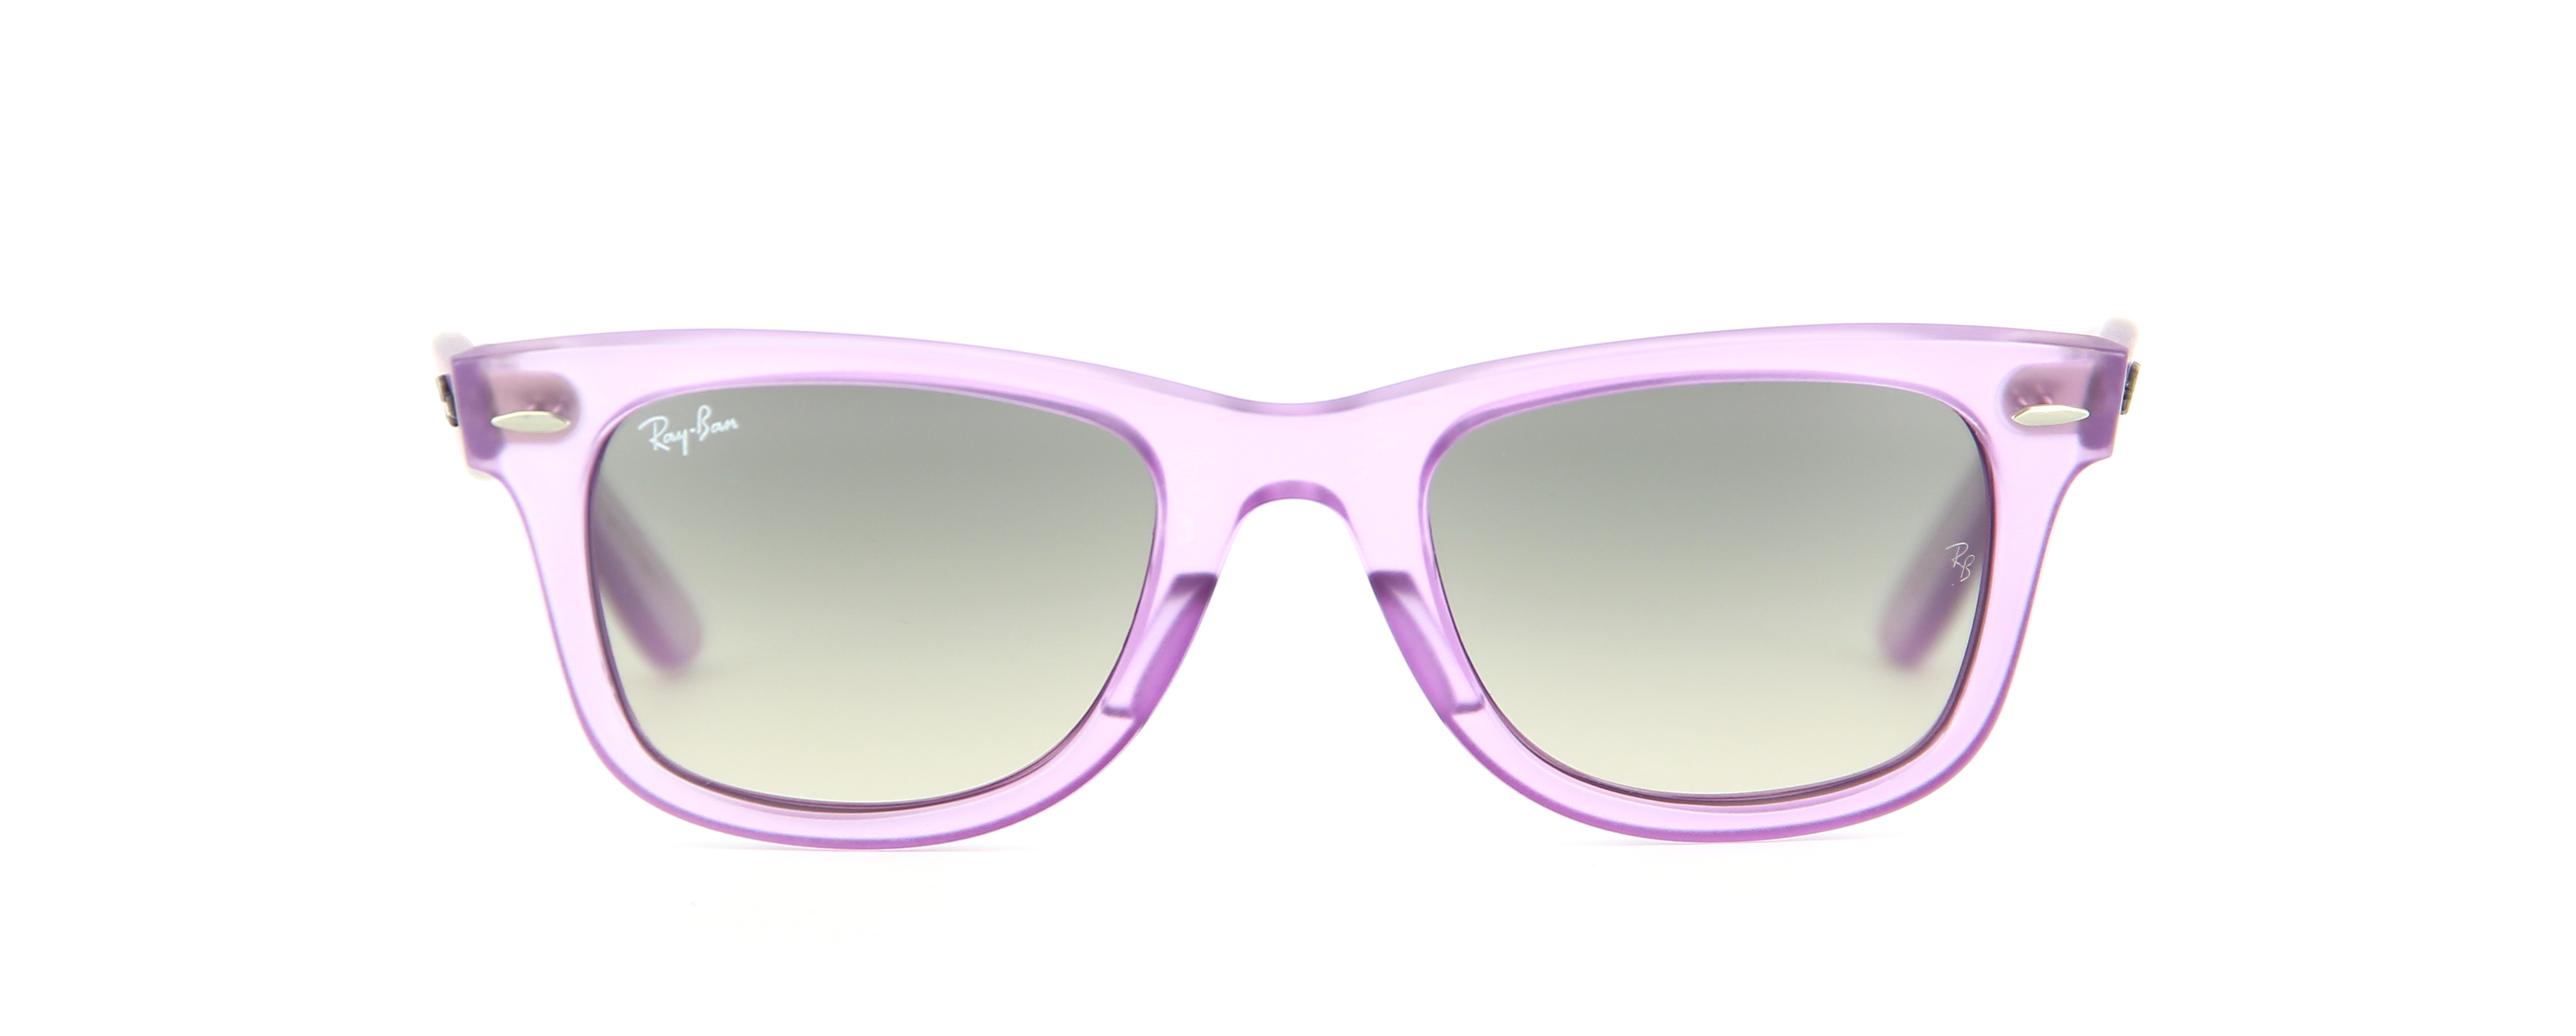 Sunglasses Oakley Heritage « Blackpool Malta dFFzHAwq 6c114c6027ea4